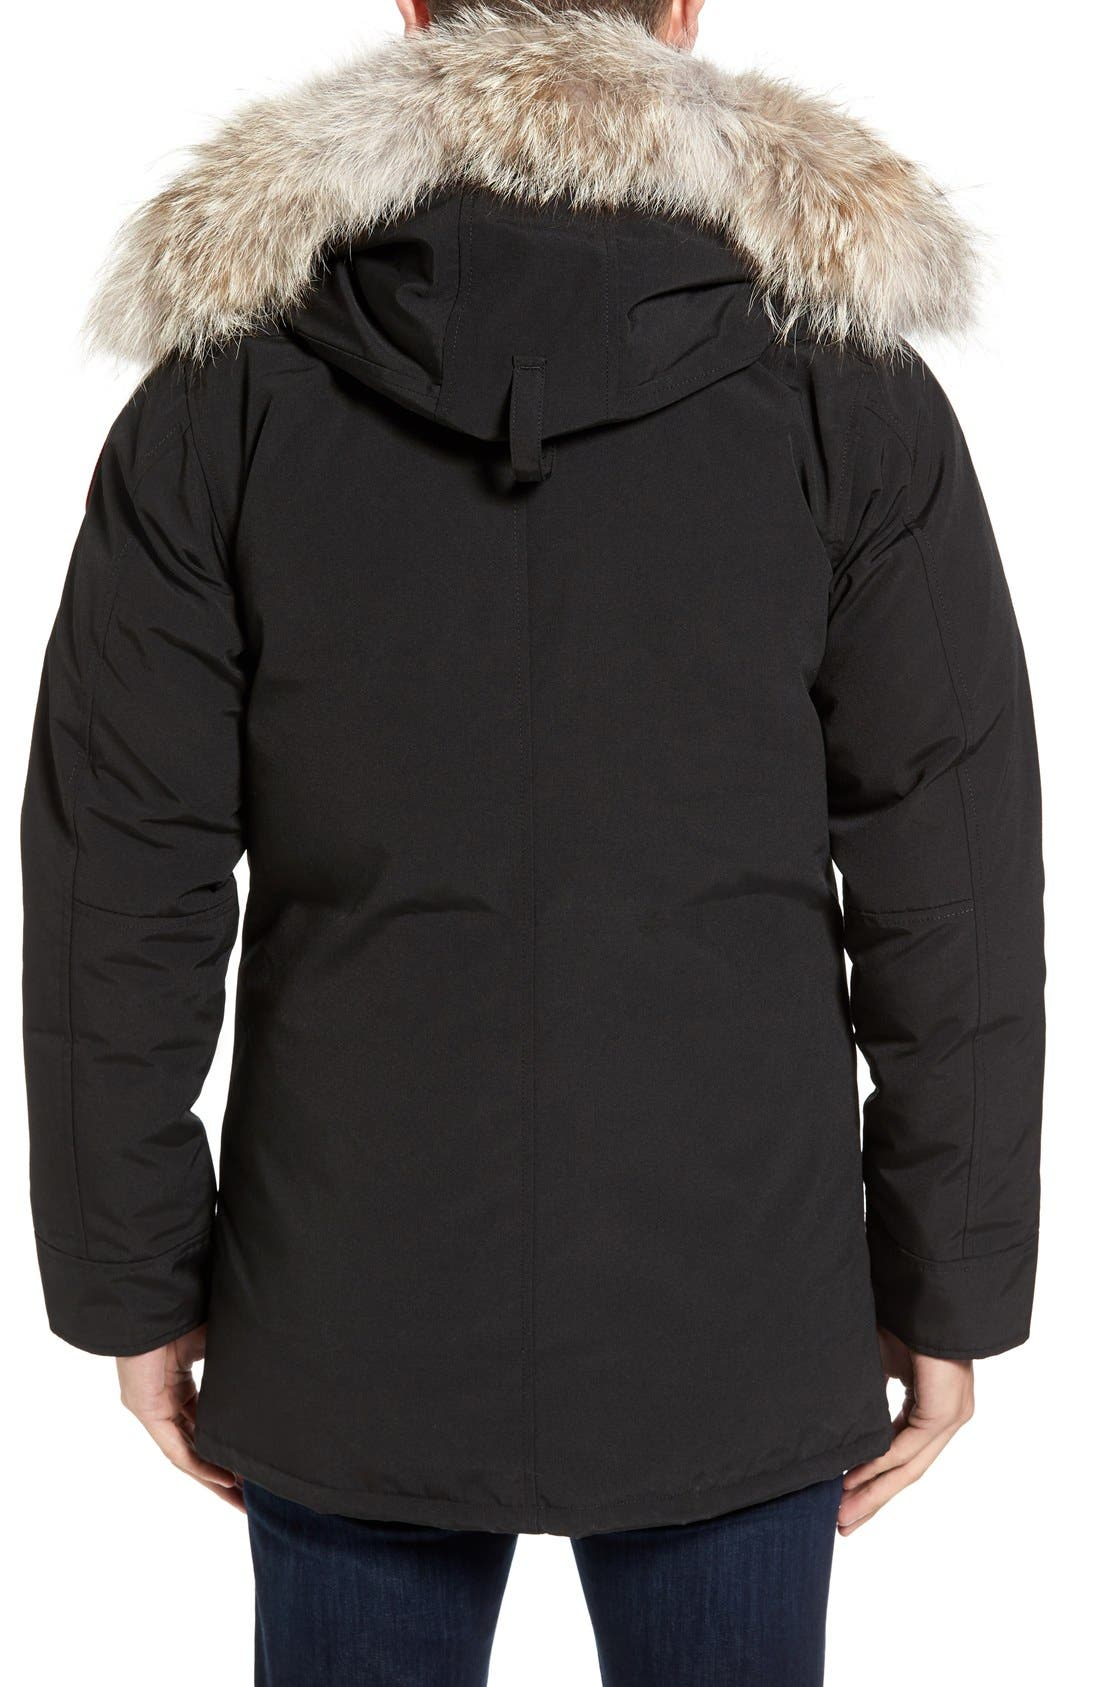 Alternate Image 2  - Canada Goose 'Chateau' Slim Fit Genuine Coyote Fur Trim Jacket